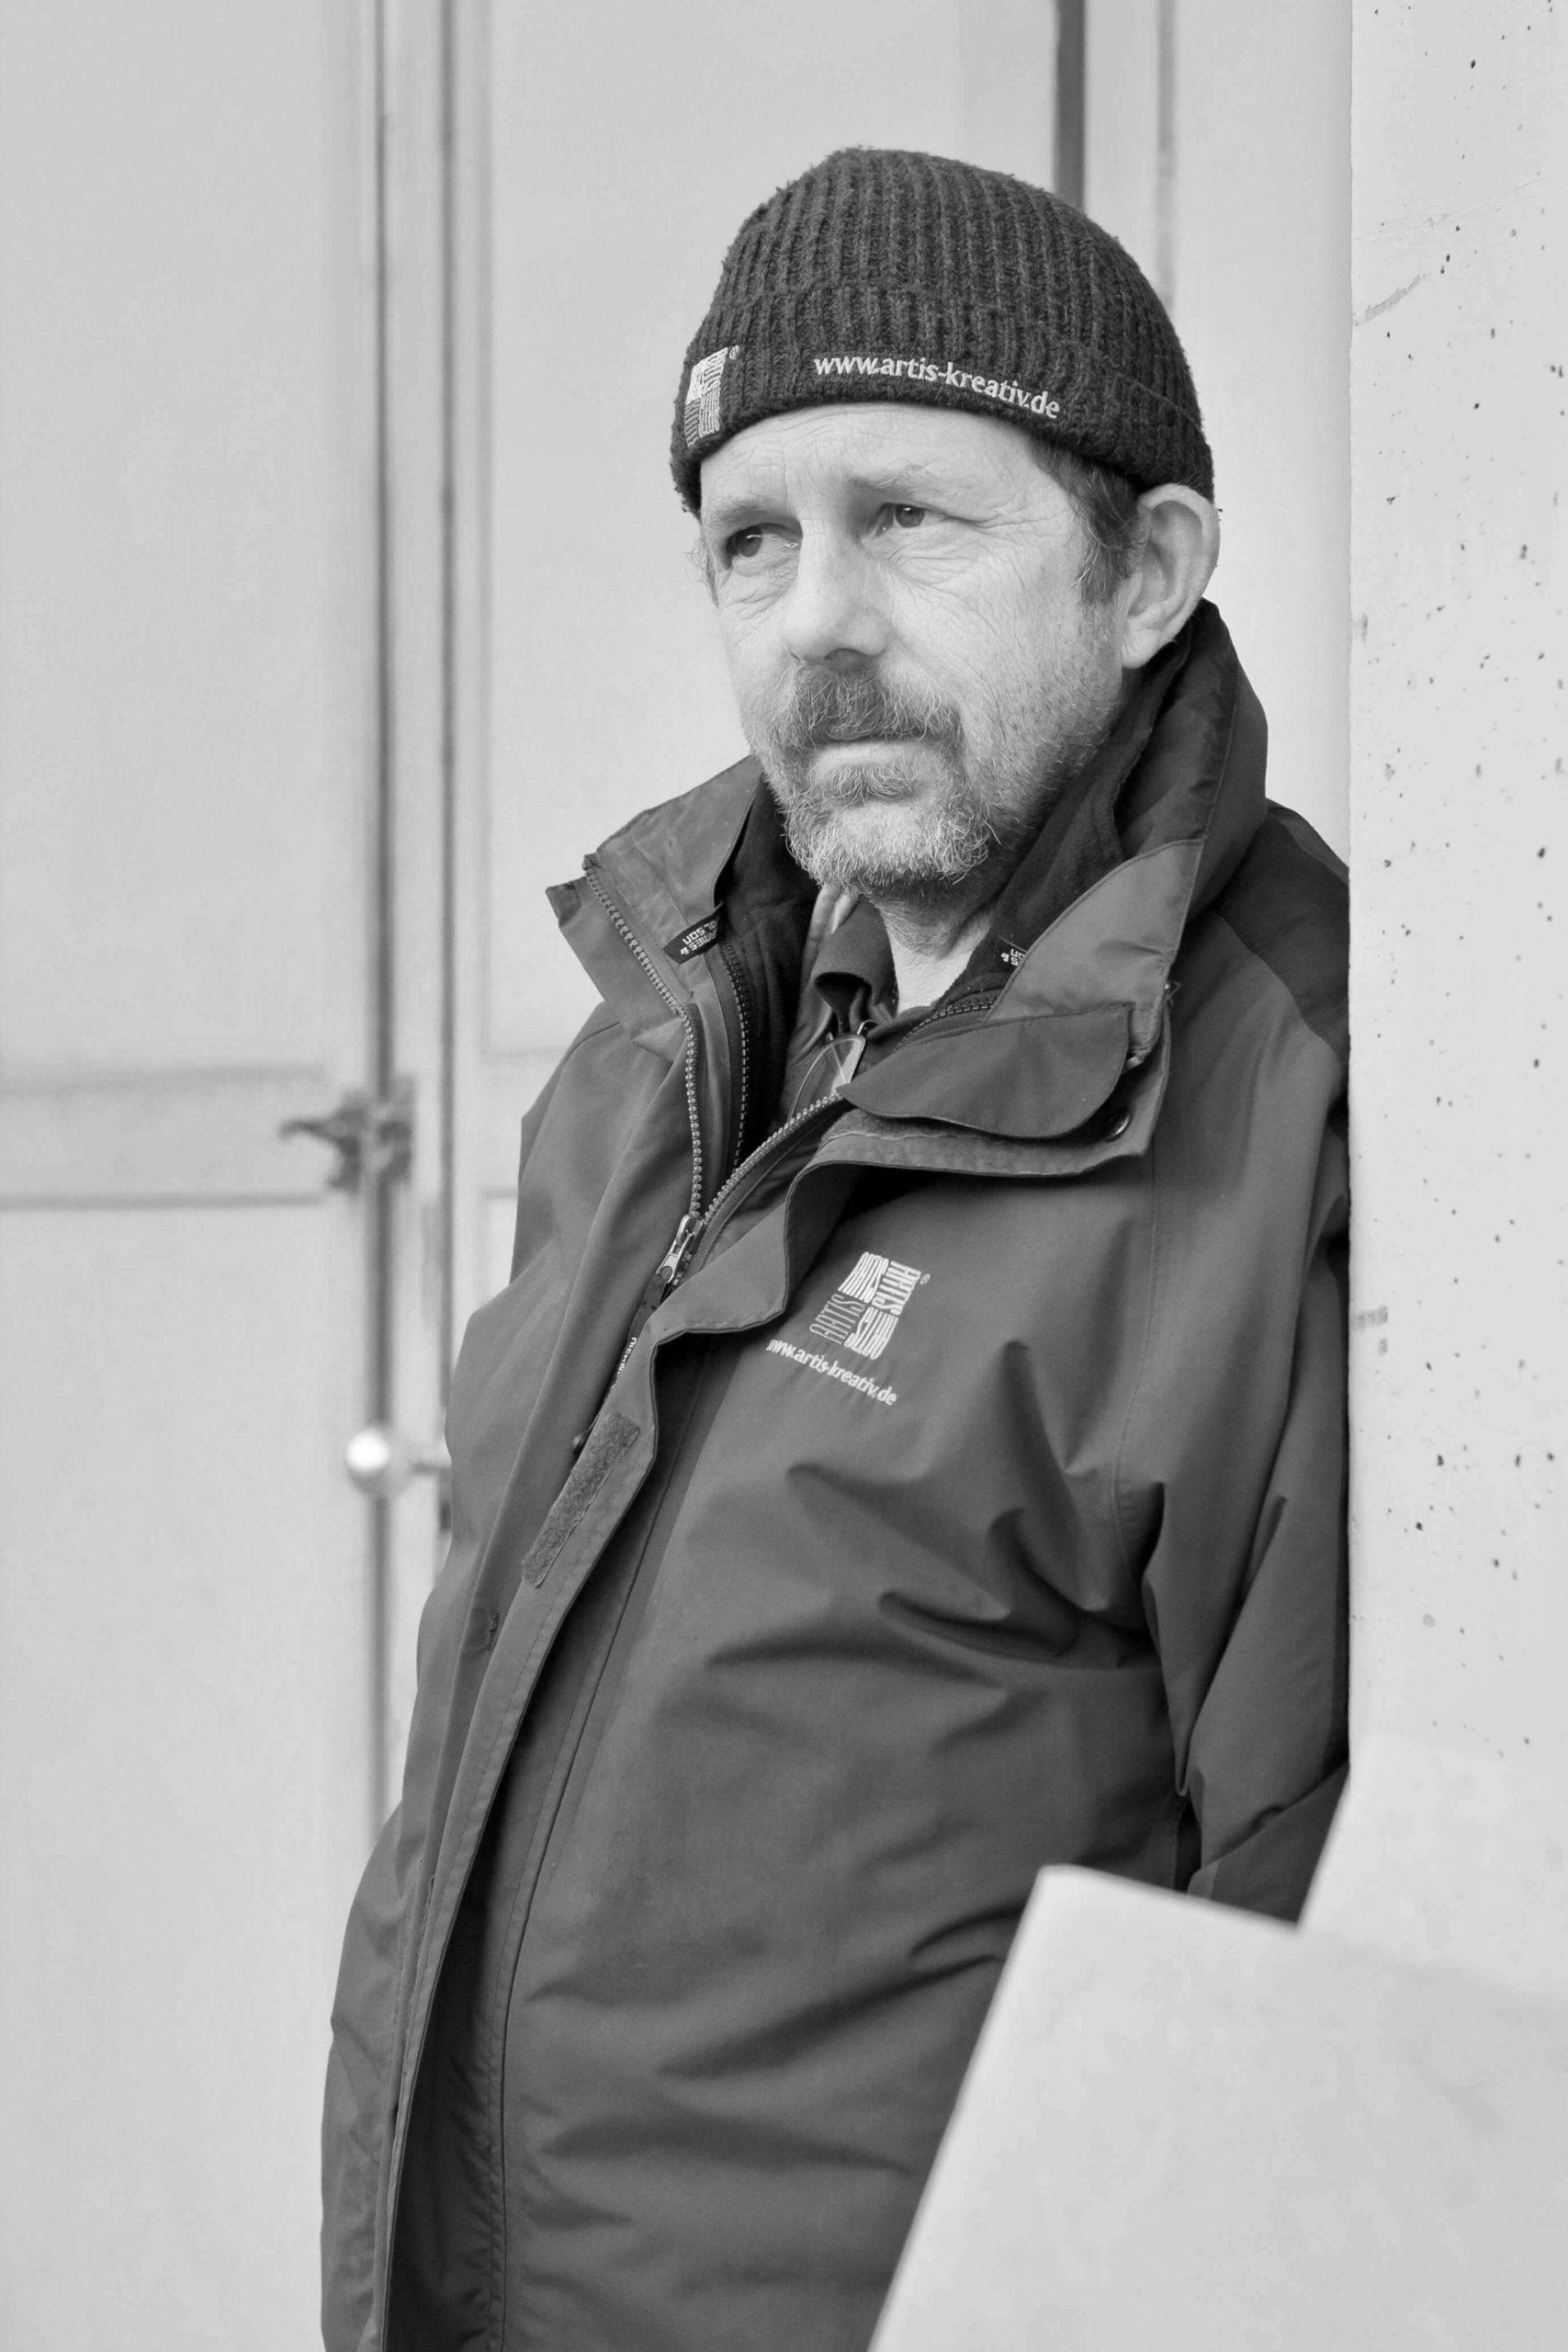 Michael Stocker - ARTIS kreativ Au i.d. Hallertau